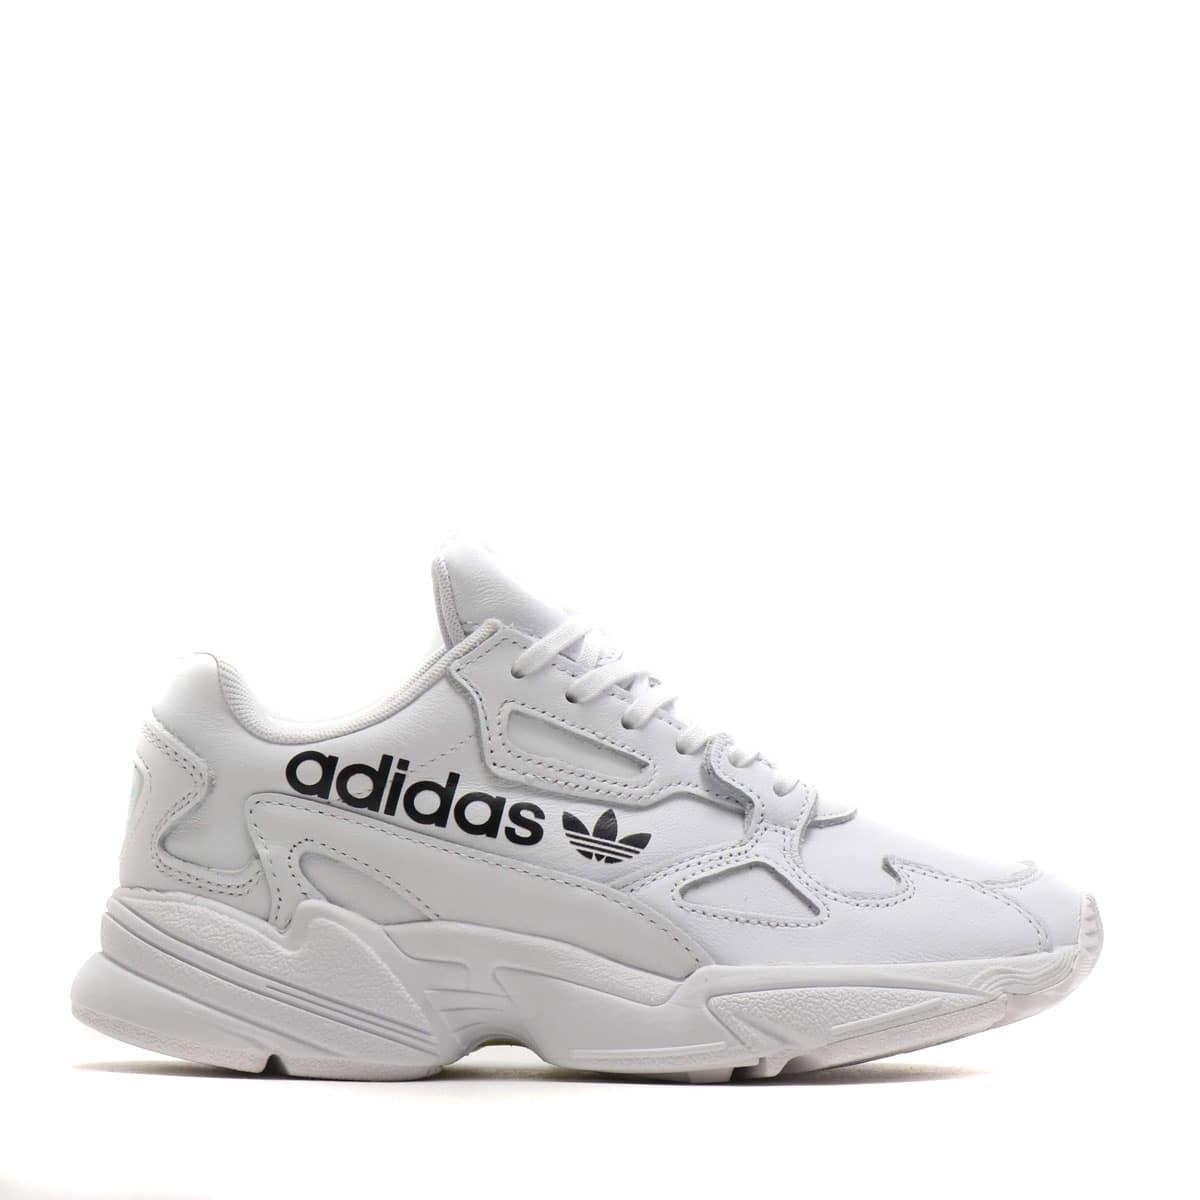 """adidas ADIDASFALCON W ランニングホワイト/ランニングホワイト/ブライトシアン 19SS-S""_photo_2"